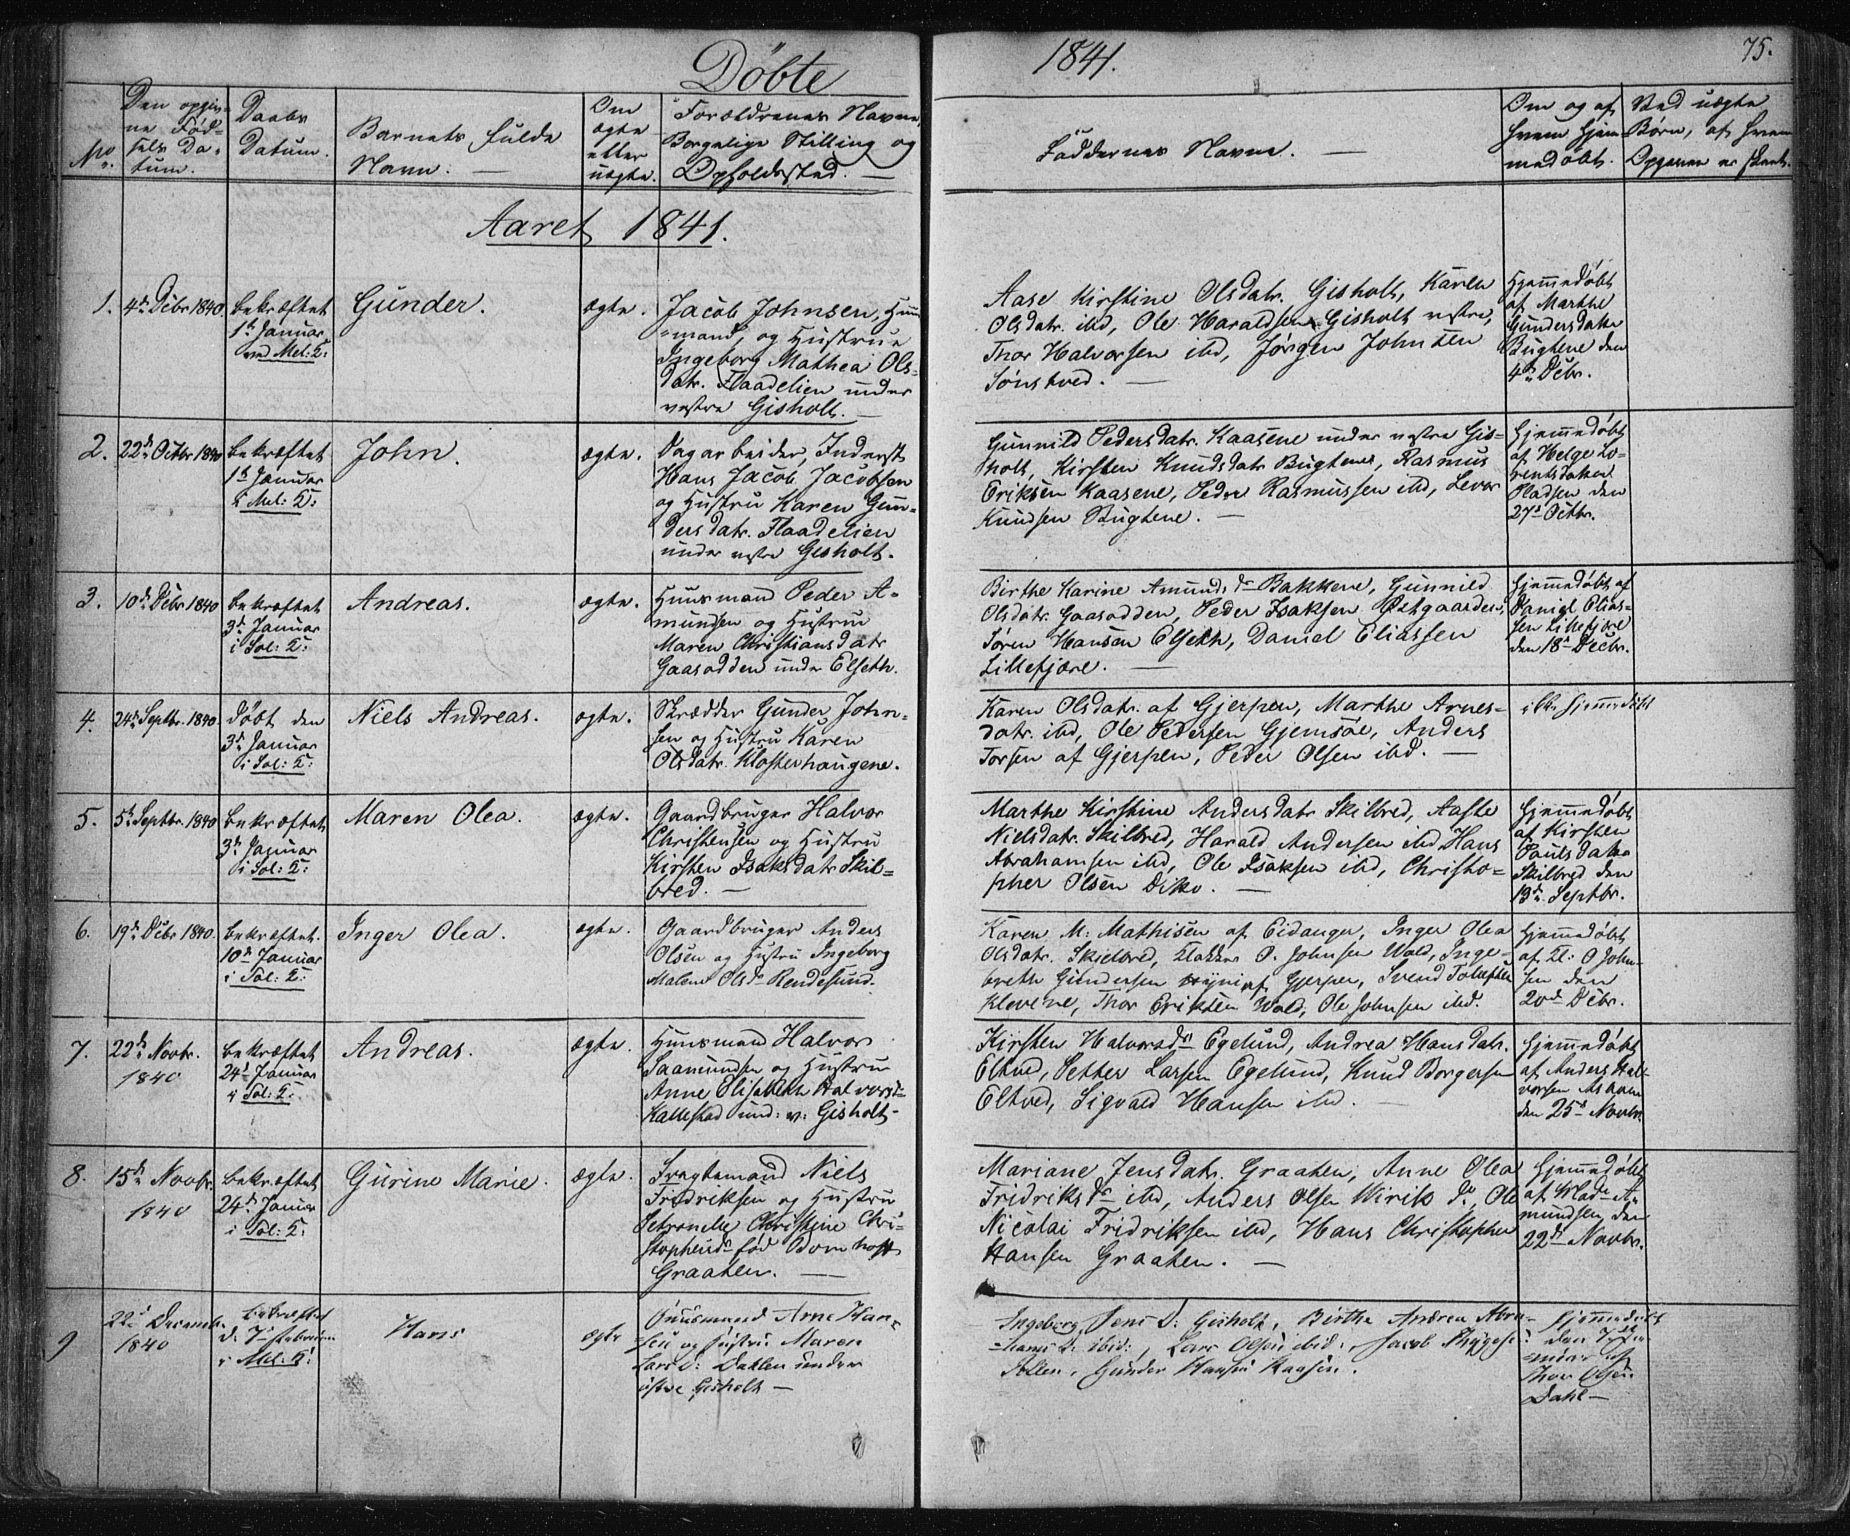 SAKO, Solum kirkebøker, F/Fa/L0005: Ministerialbok nr. I 5, 1833-1843, s. 75